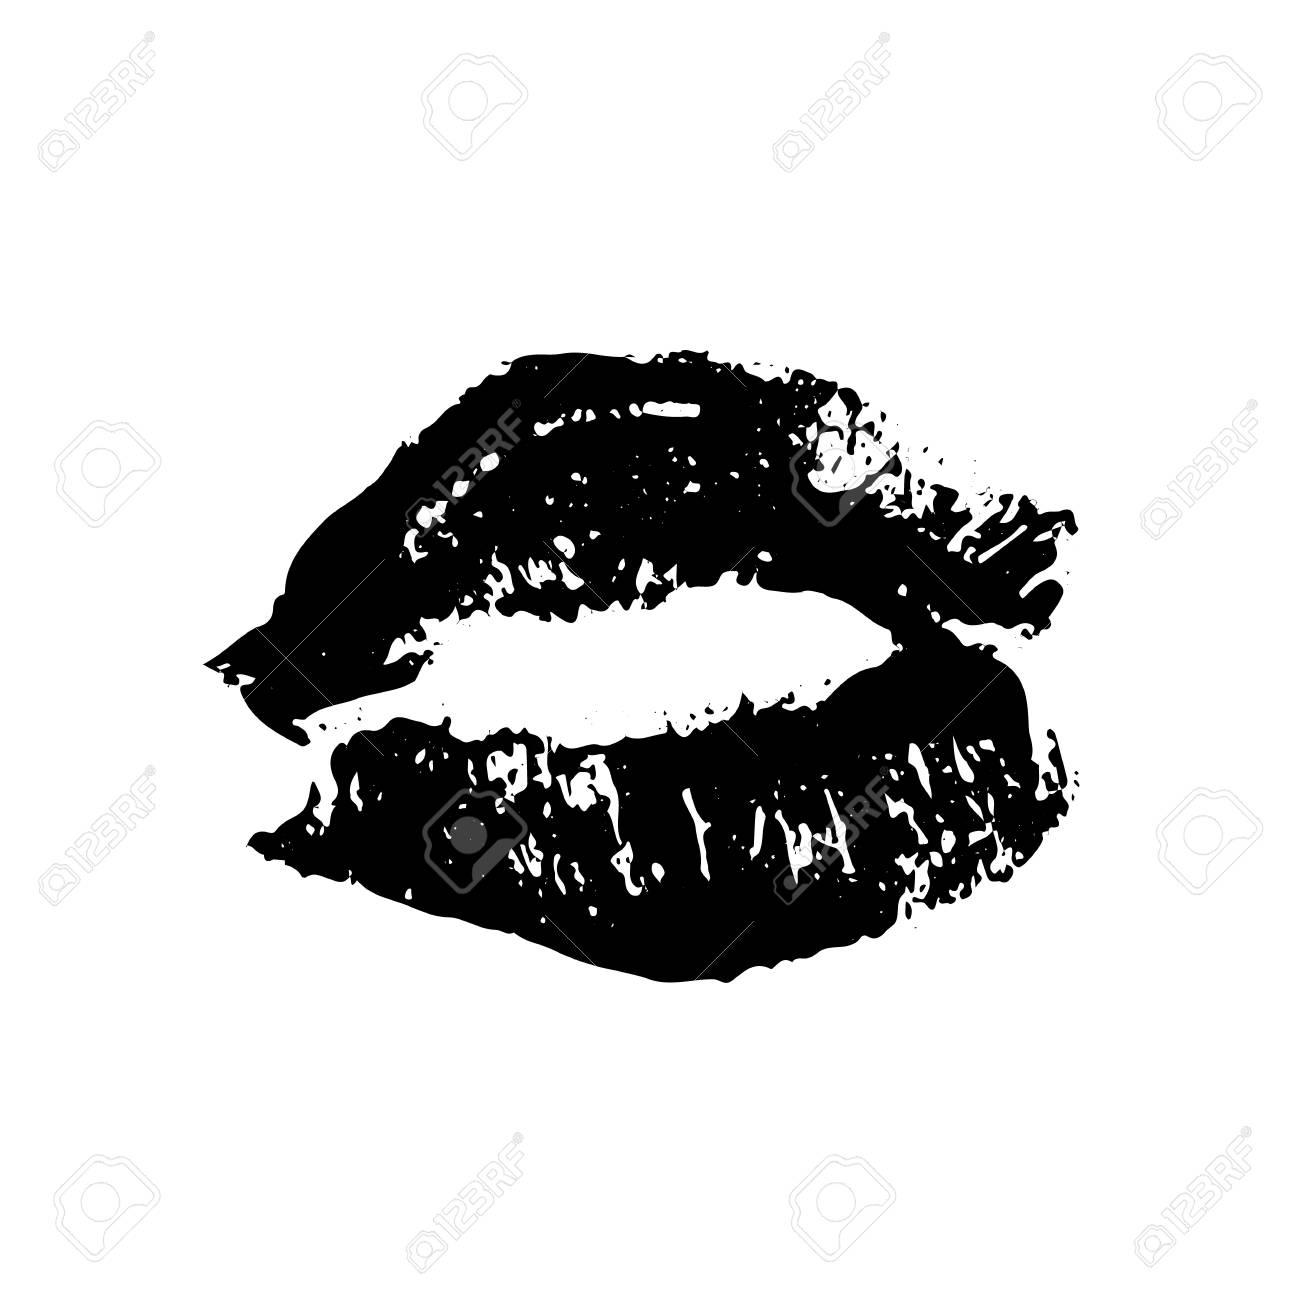 Black lipstick kiss on white background imprint of the lips kiss mark vector illustration